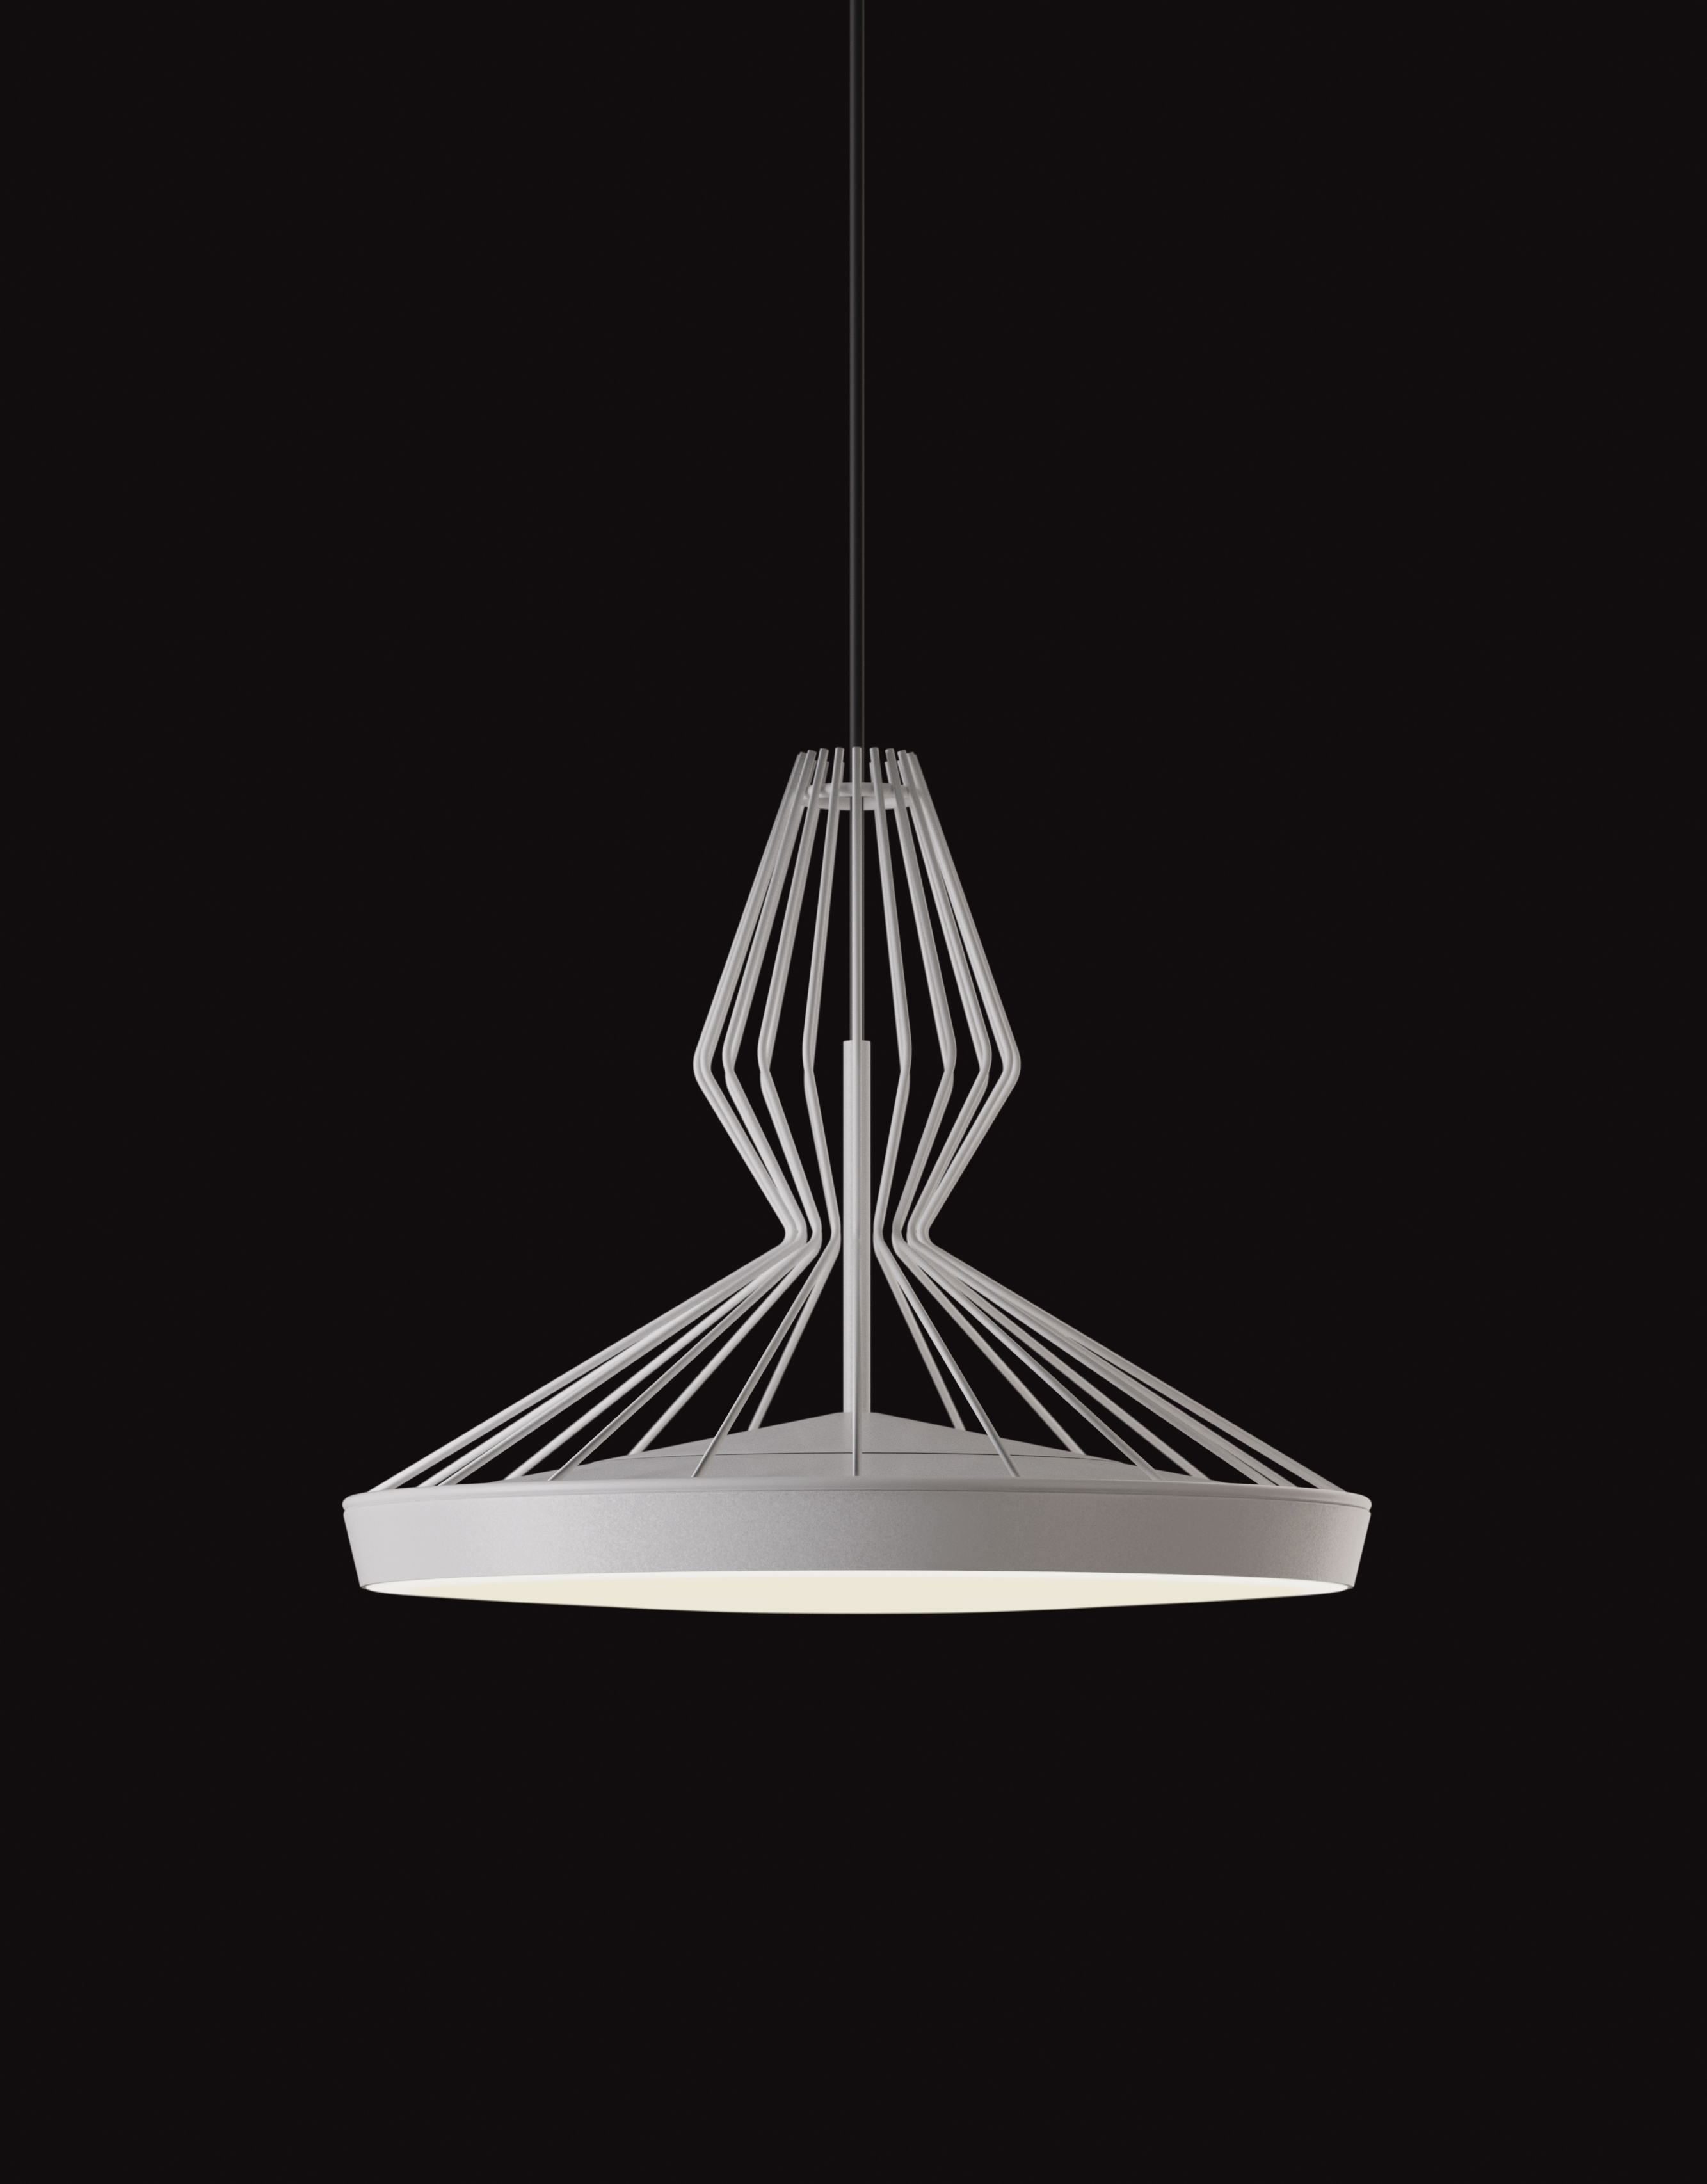 Royale Pendant Ocl Architectural Lighting